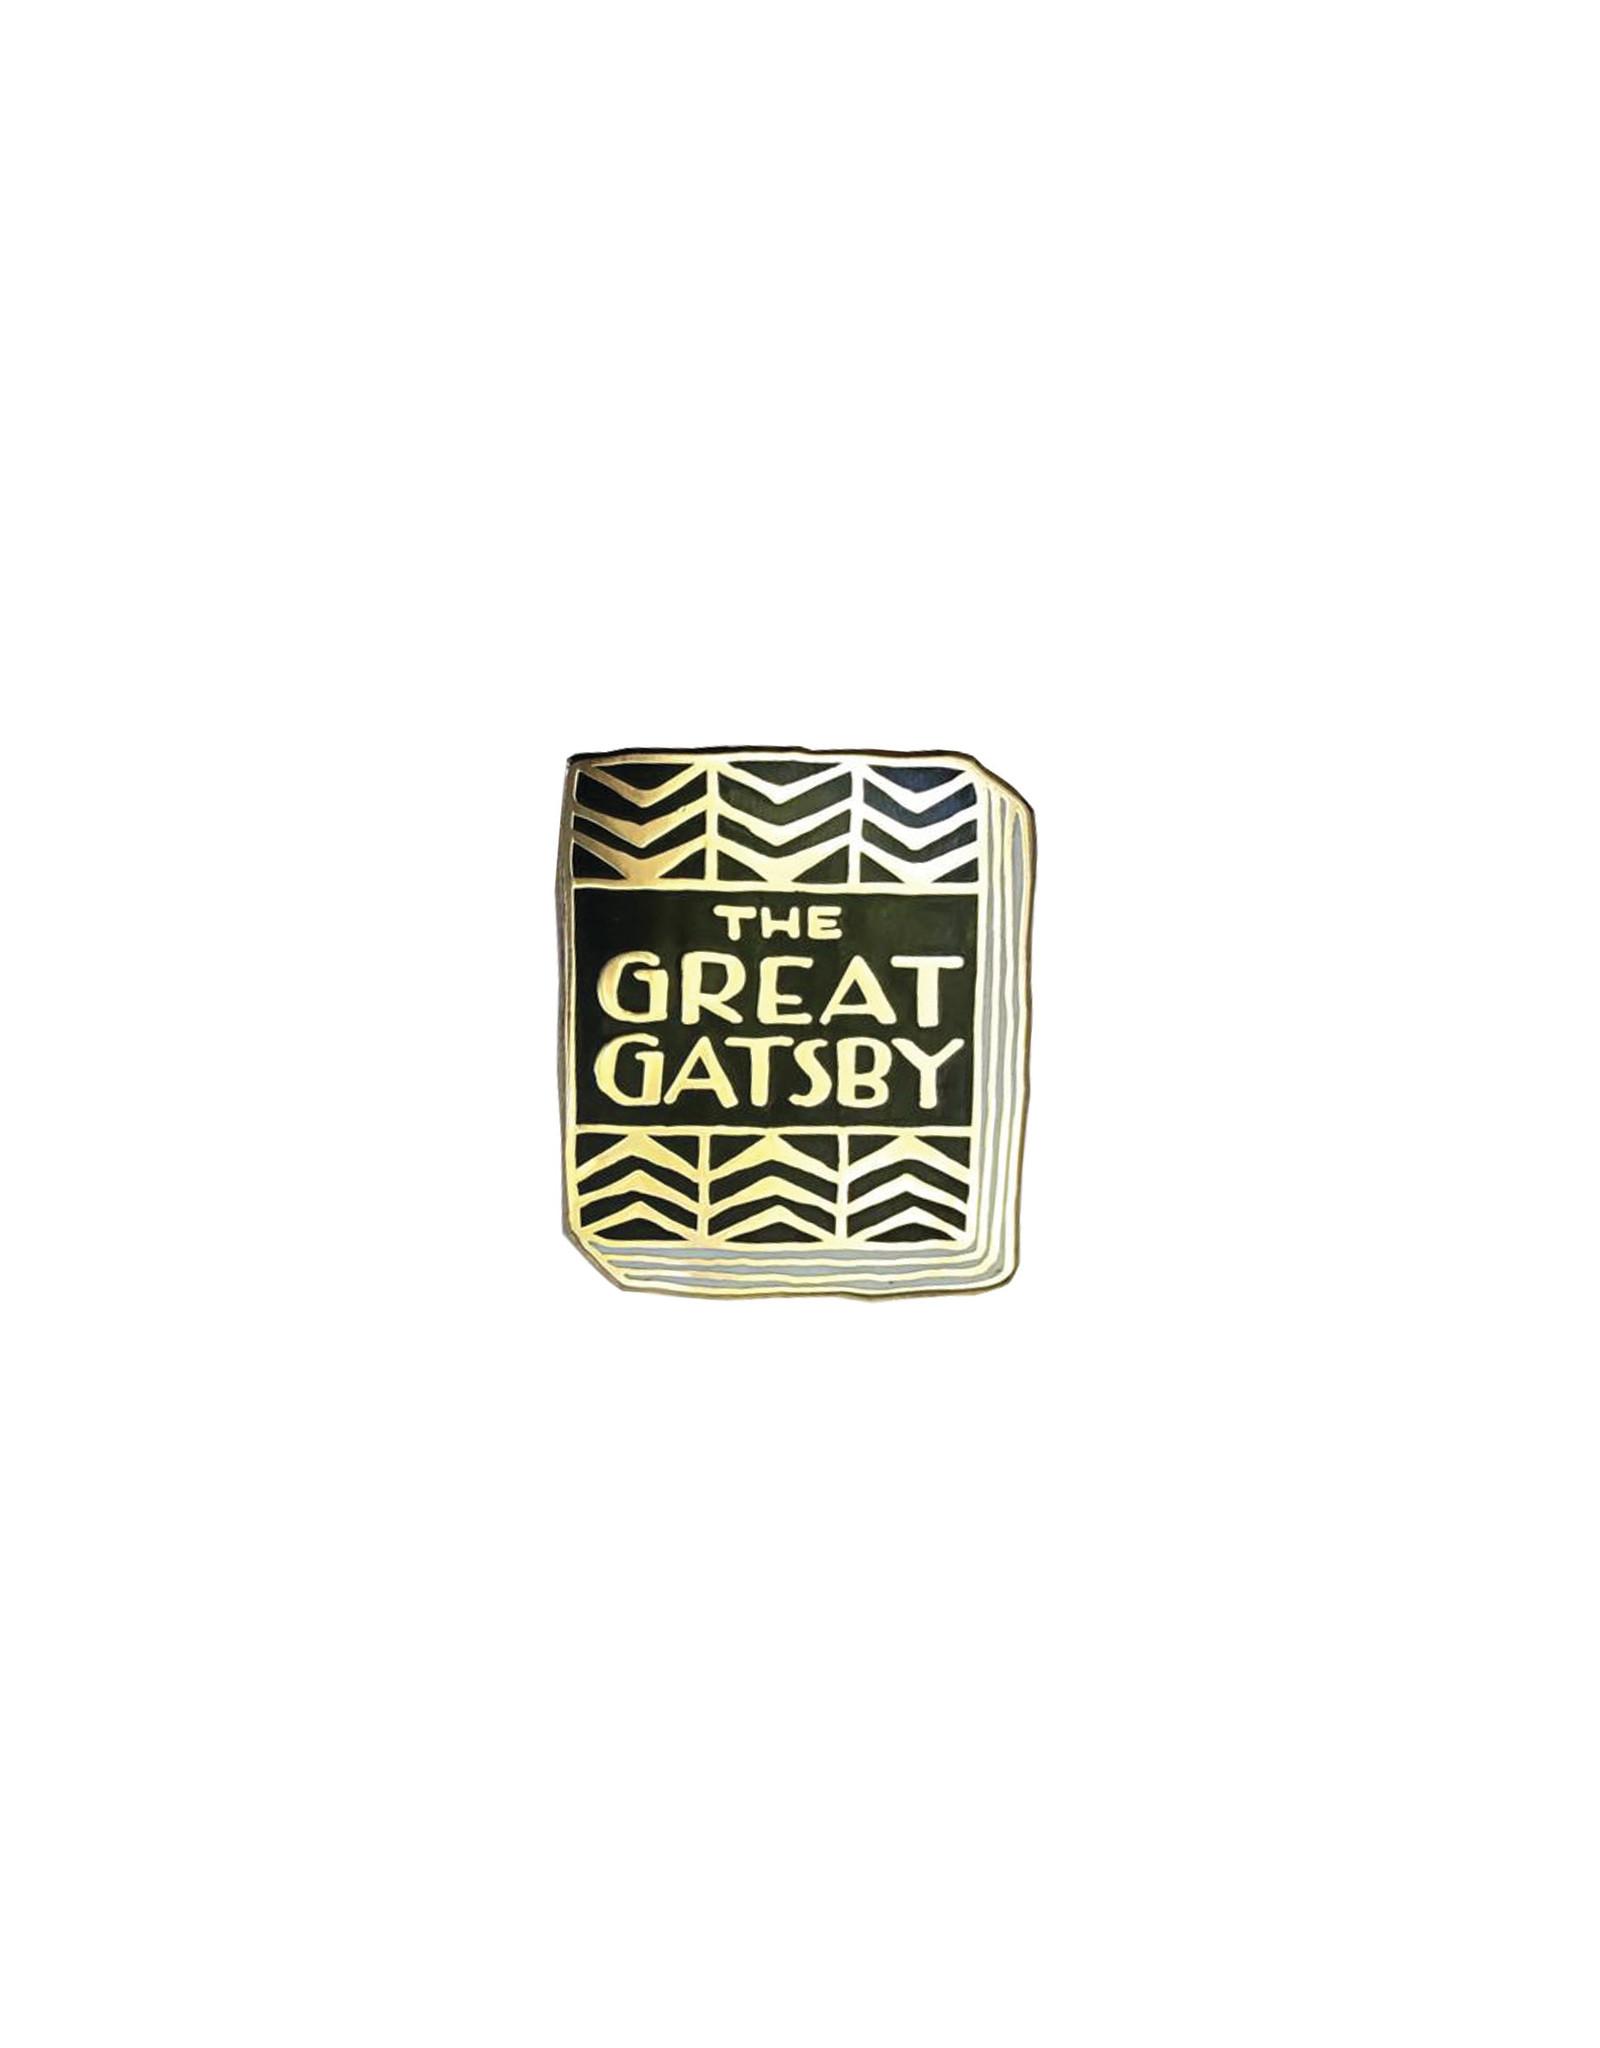 Ideal Bookshelf Book Pin: The Great Gatsby